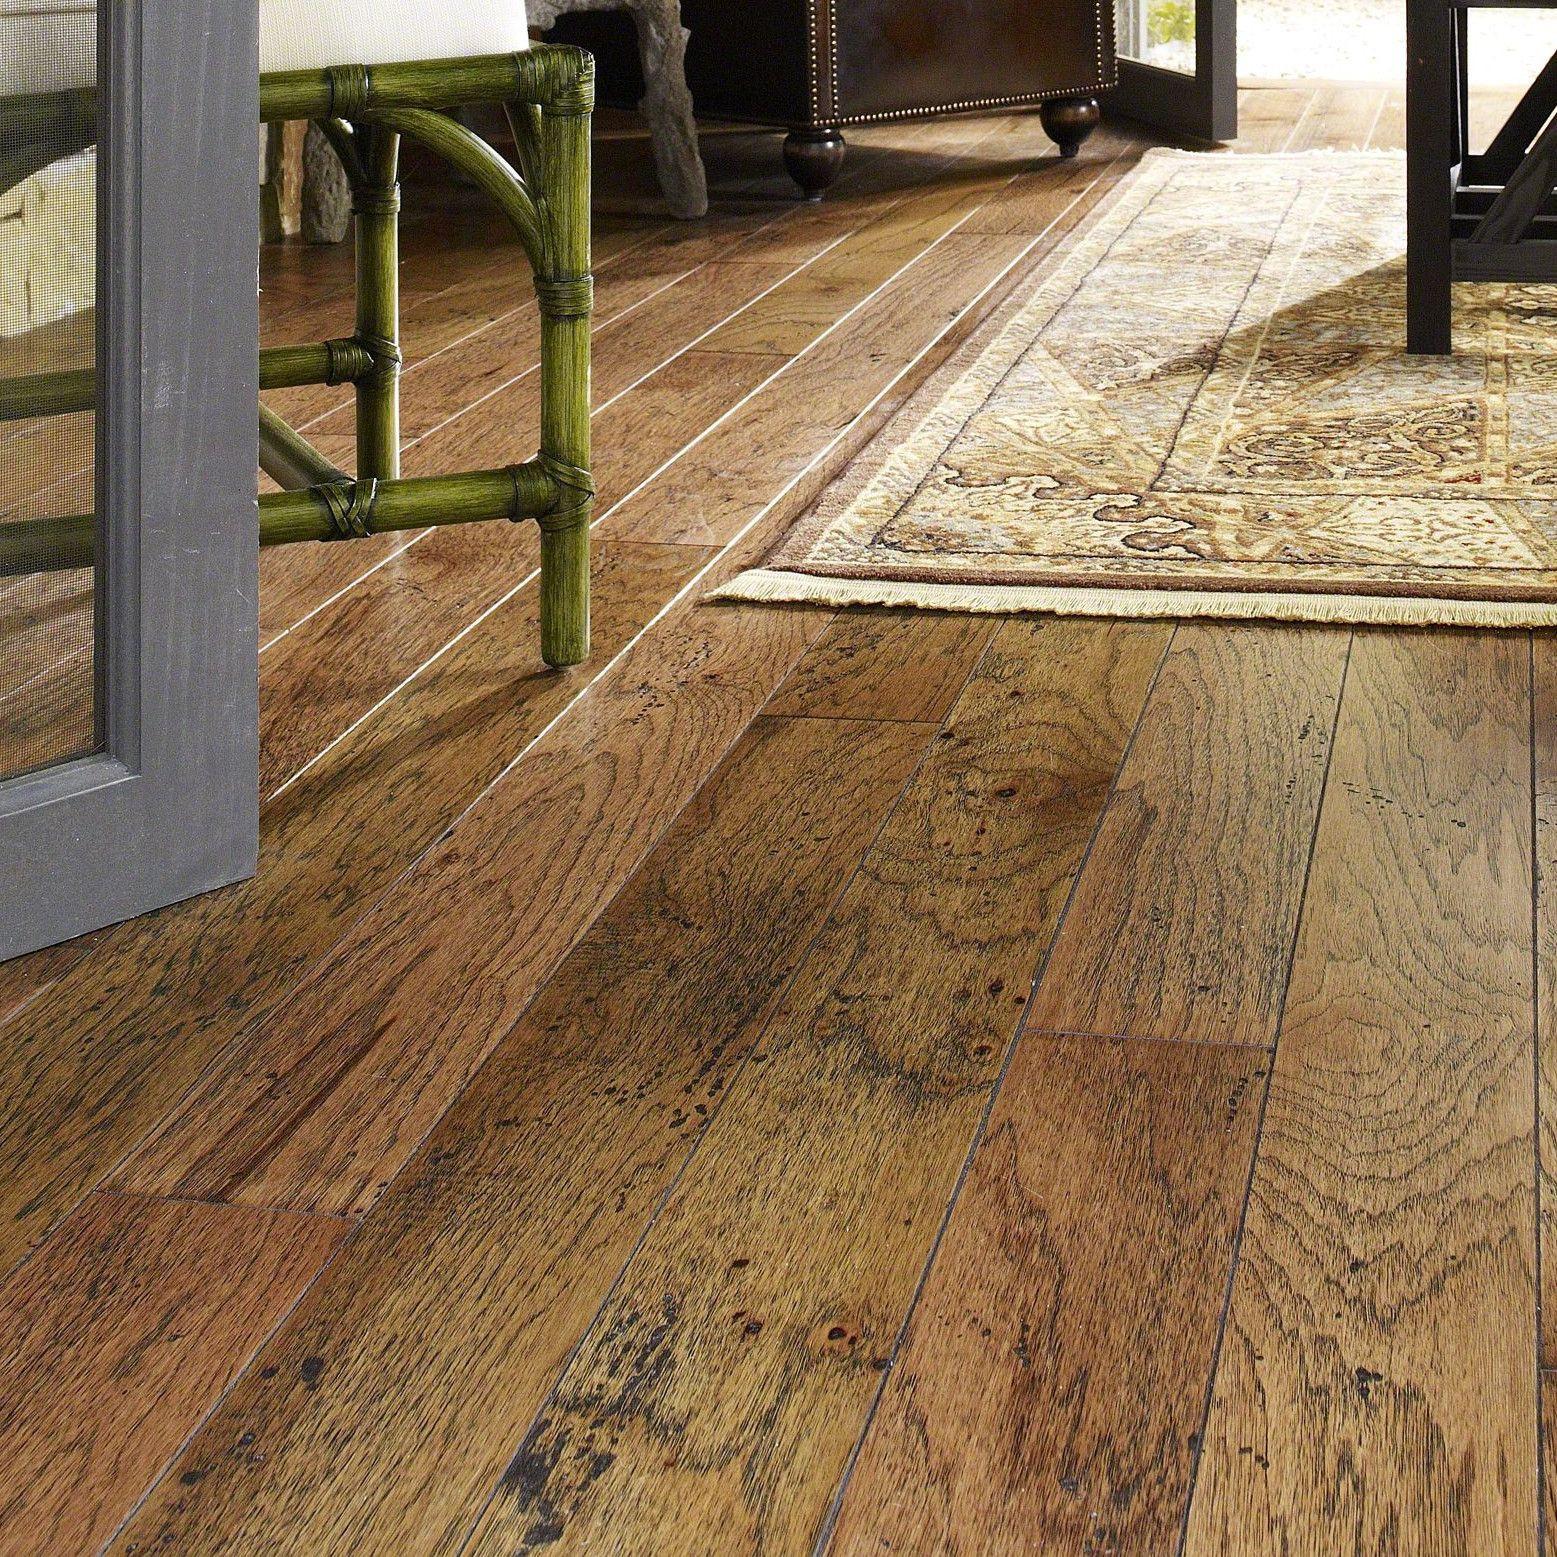 different types of engineered hardwood flooring of shaw floors rosedown 5 engineered hickory hardwood flooring in with regard to shaw floors rosedown 5 engineered hickory hardwood flooring in burnt sugar